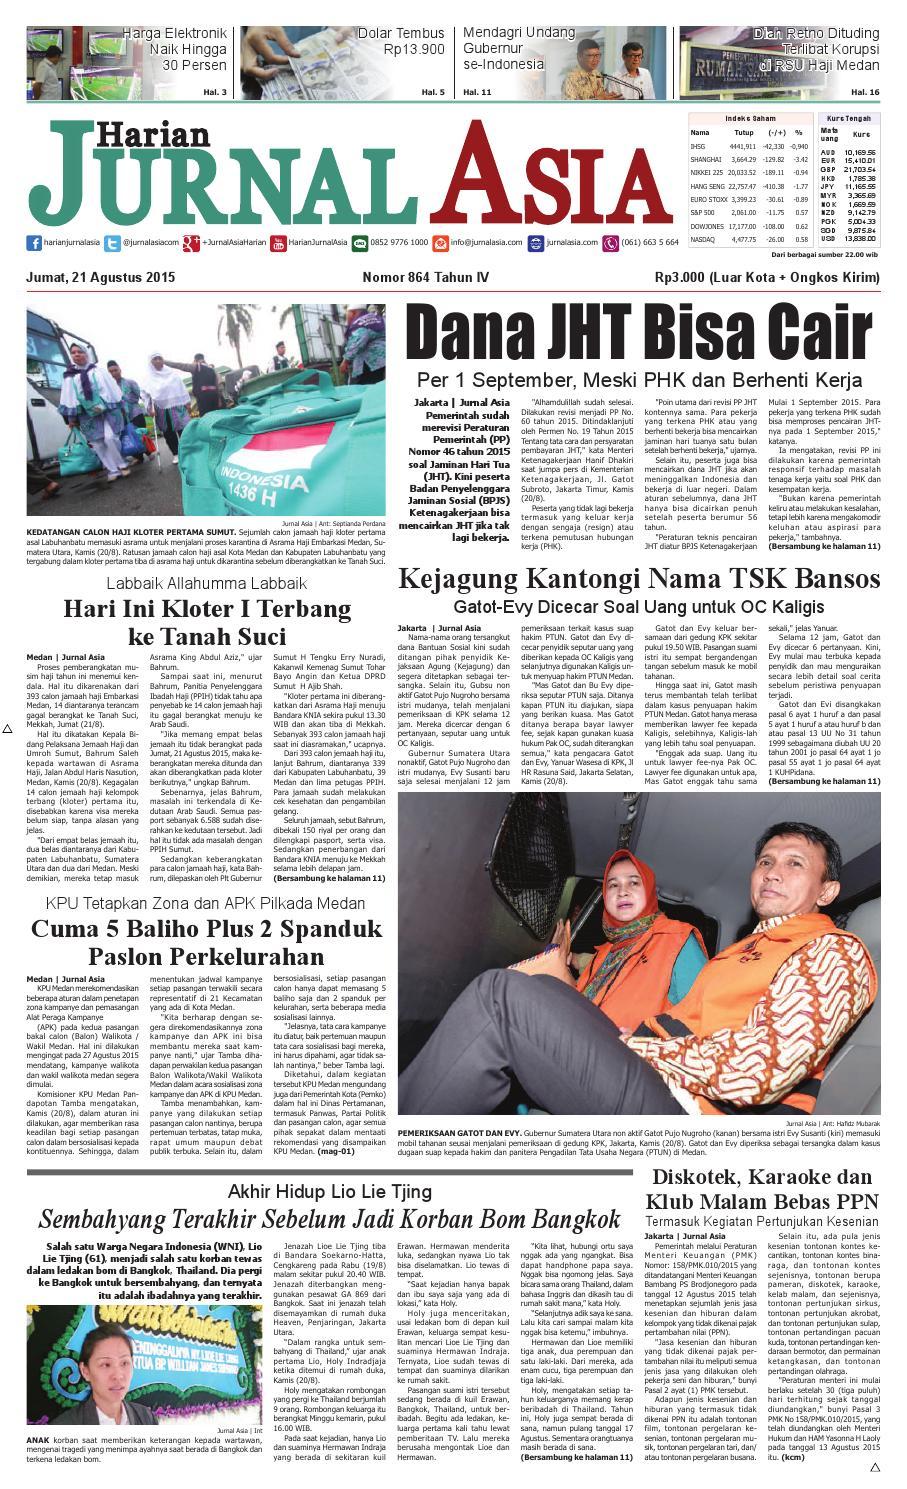 Harian Jurnal Asia Edisi Jumat 21 Agustus 2015 By Produk Ukm Bumn Chesse Pie Khas Balikpapan Medan Issuu